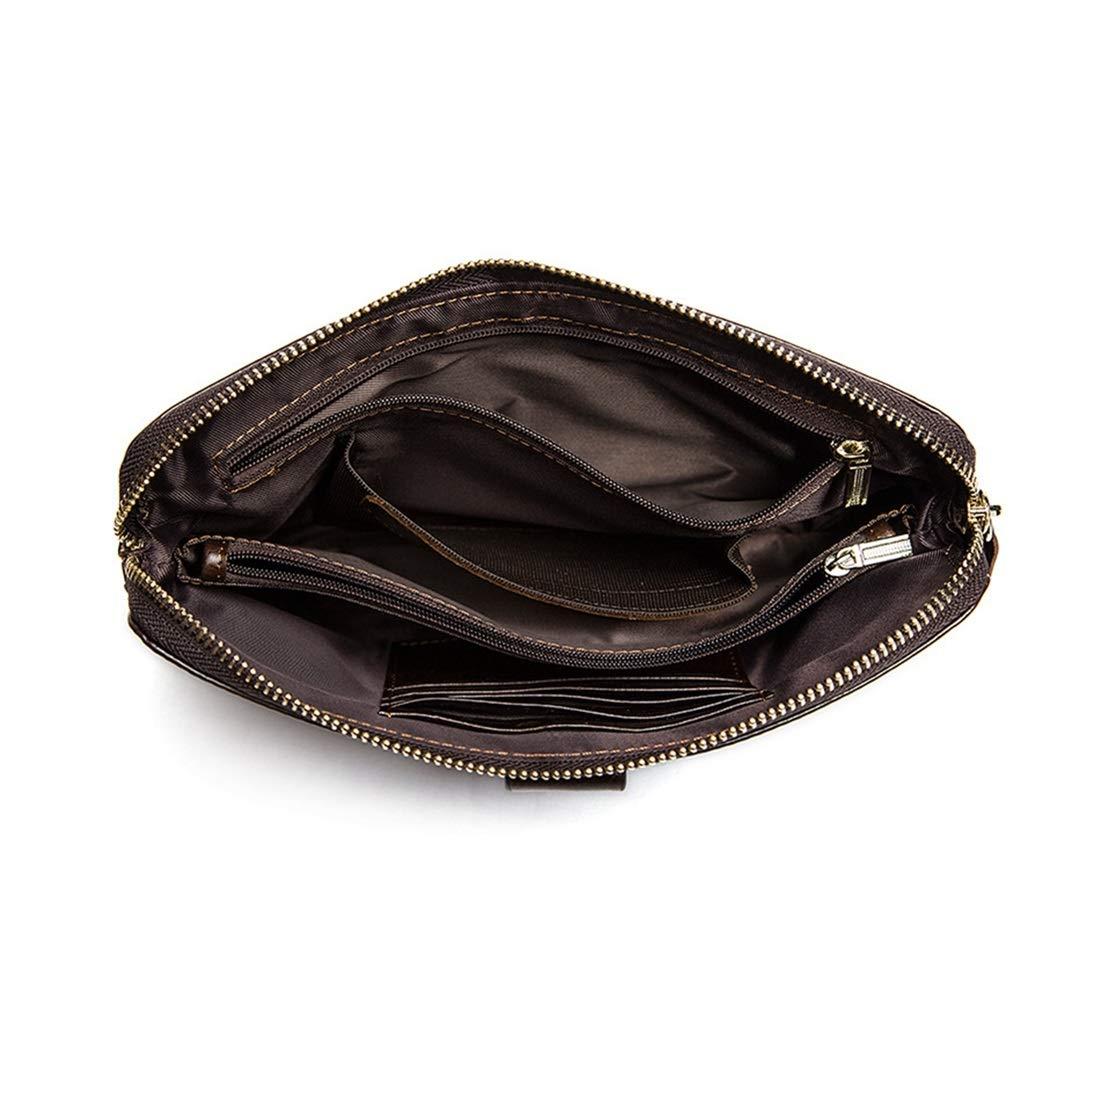 Color : Black KRPENRIO Leather Mens Purse Wallet Wallet Leather Business Mens Clutch Bag Mobile Phone Bag Purse